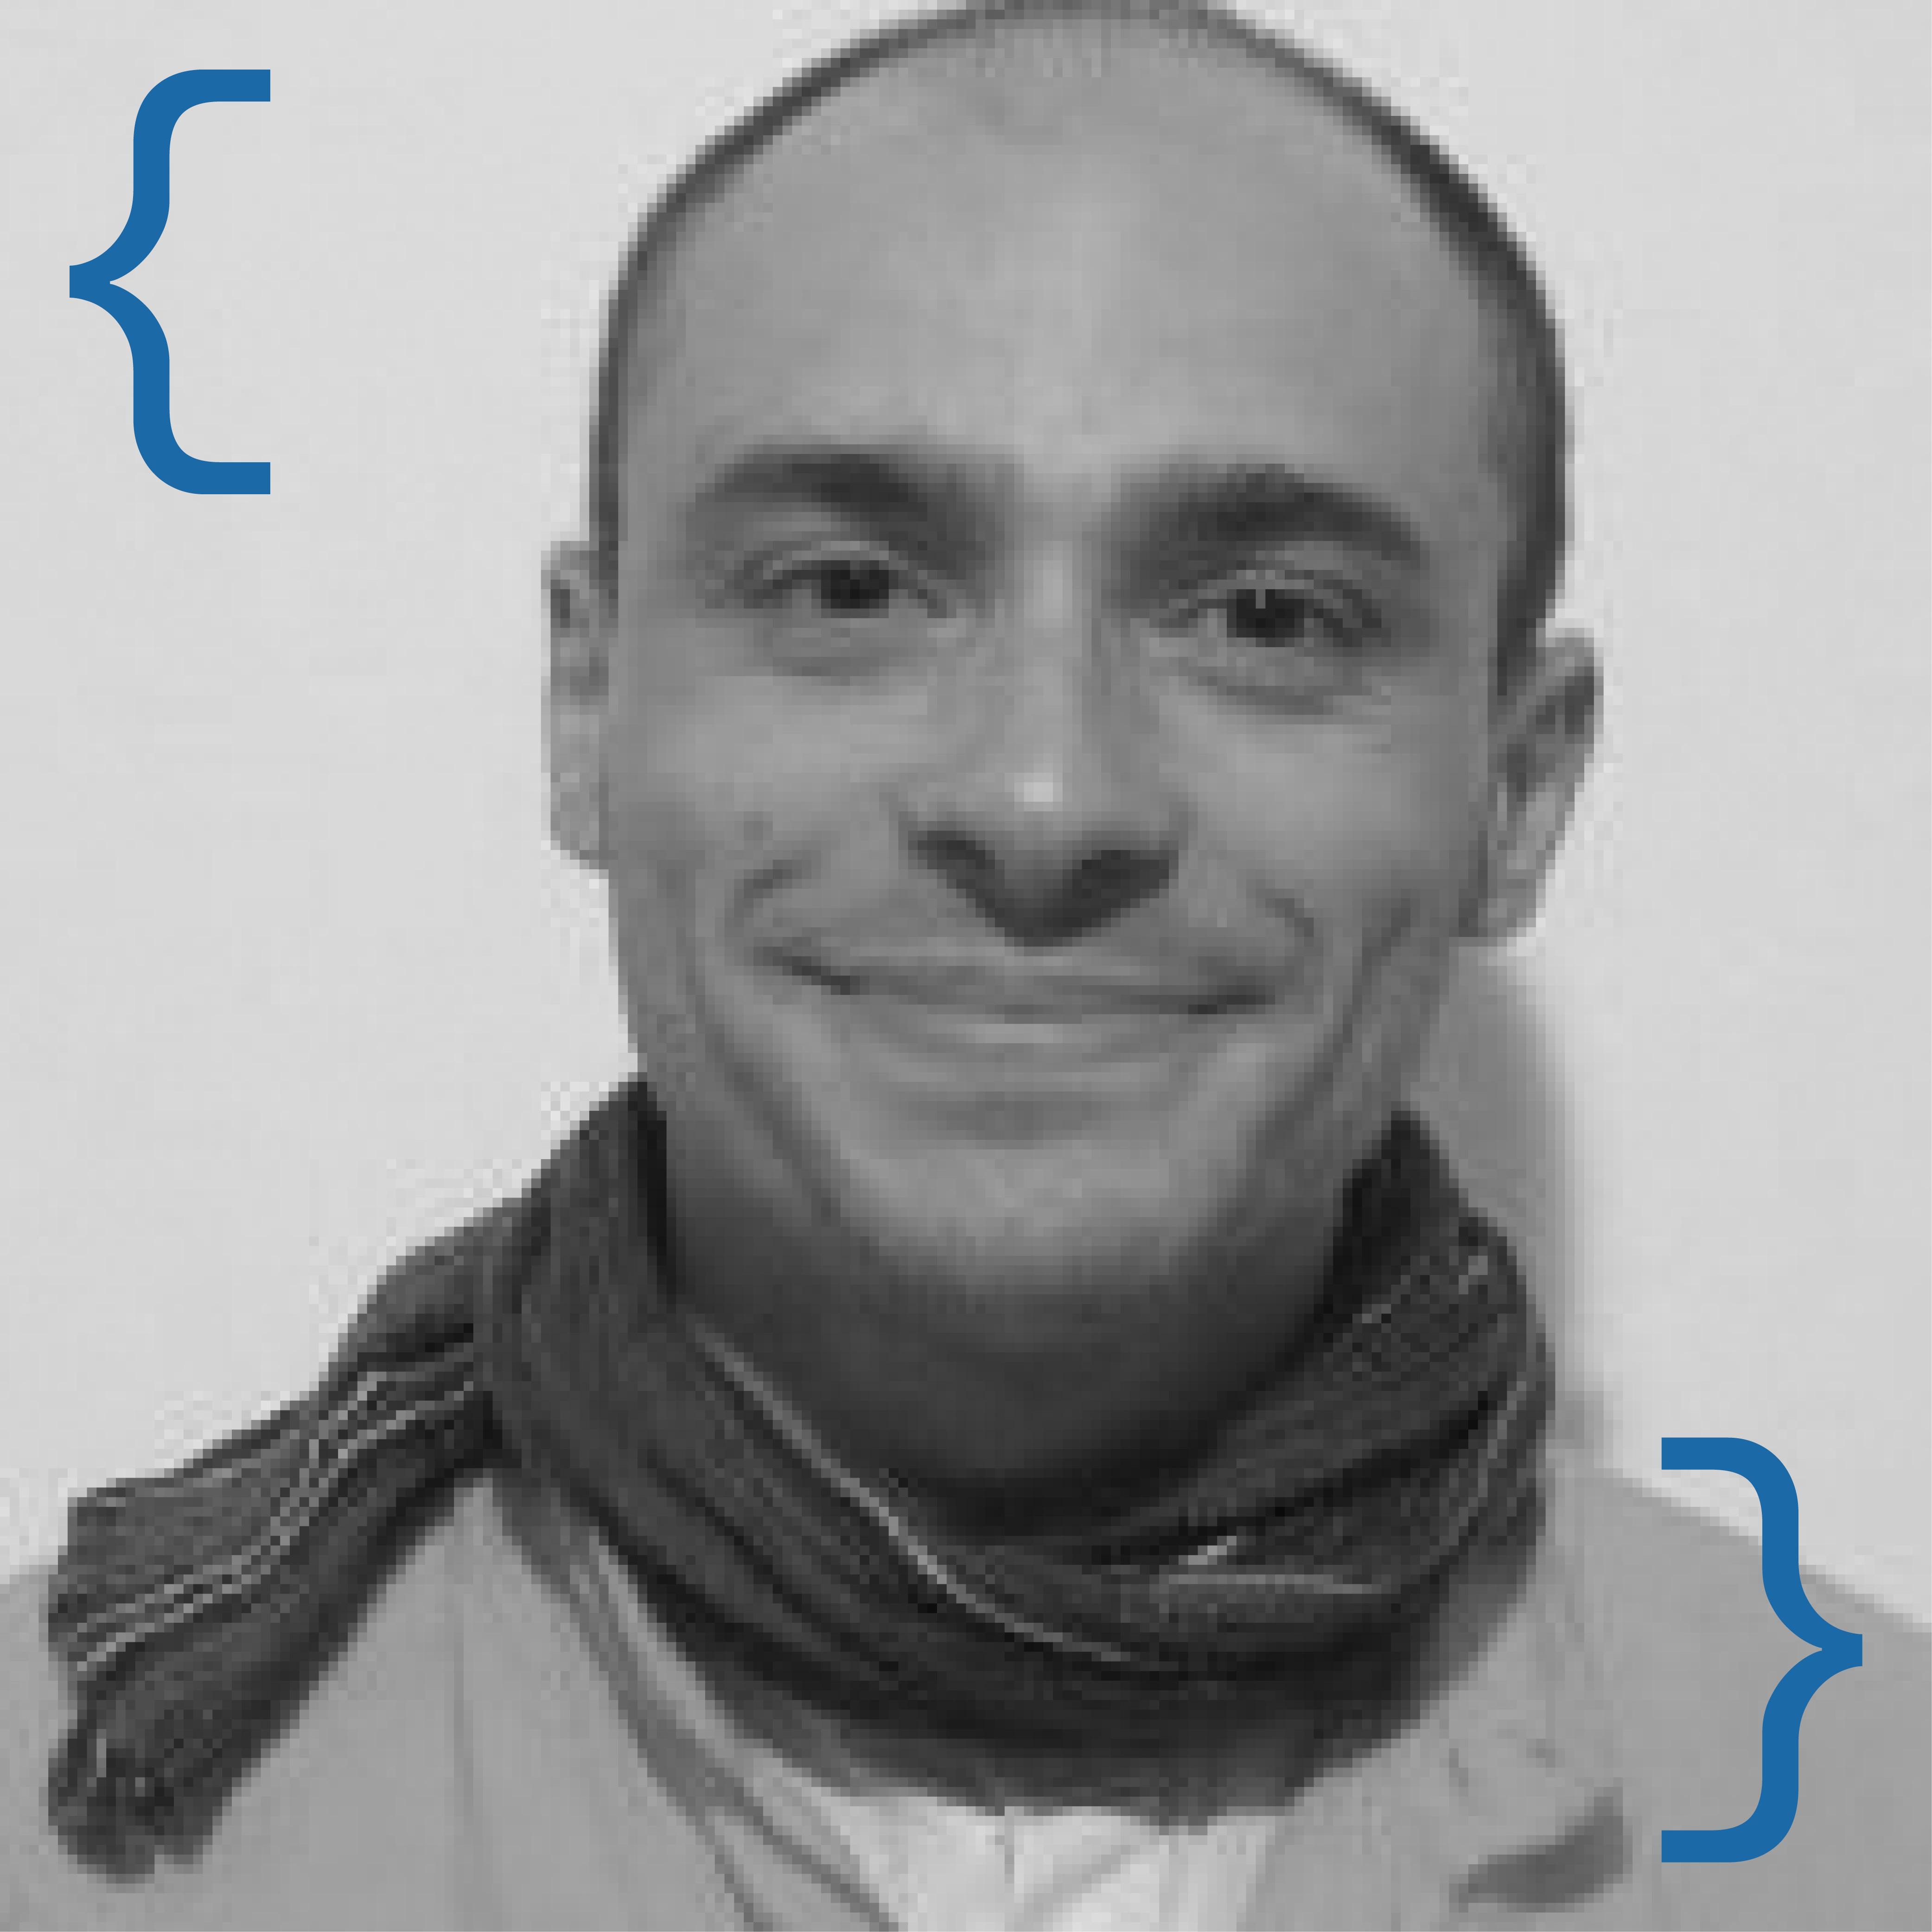 Paolo Massa